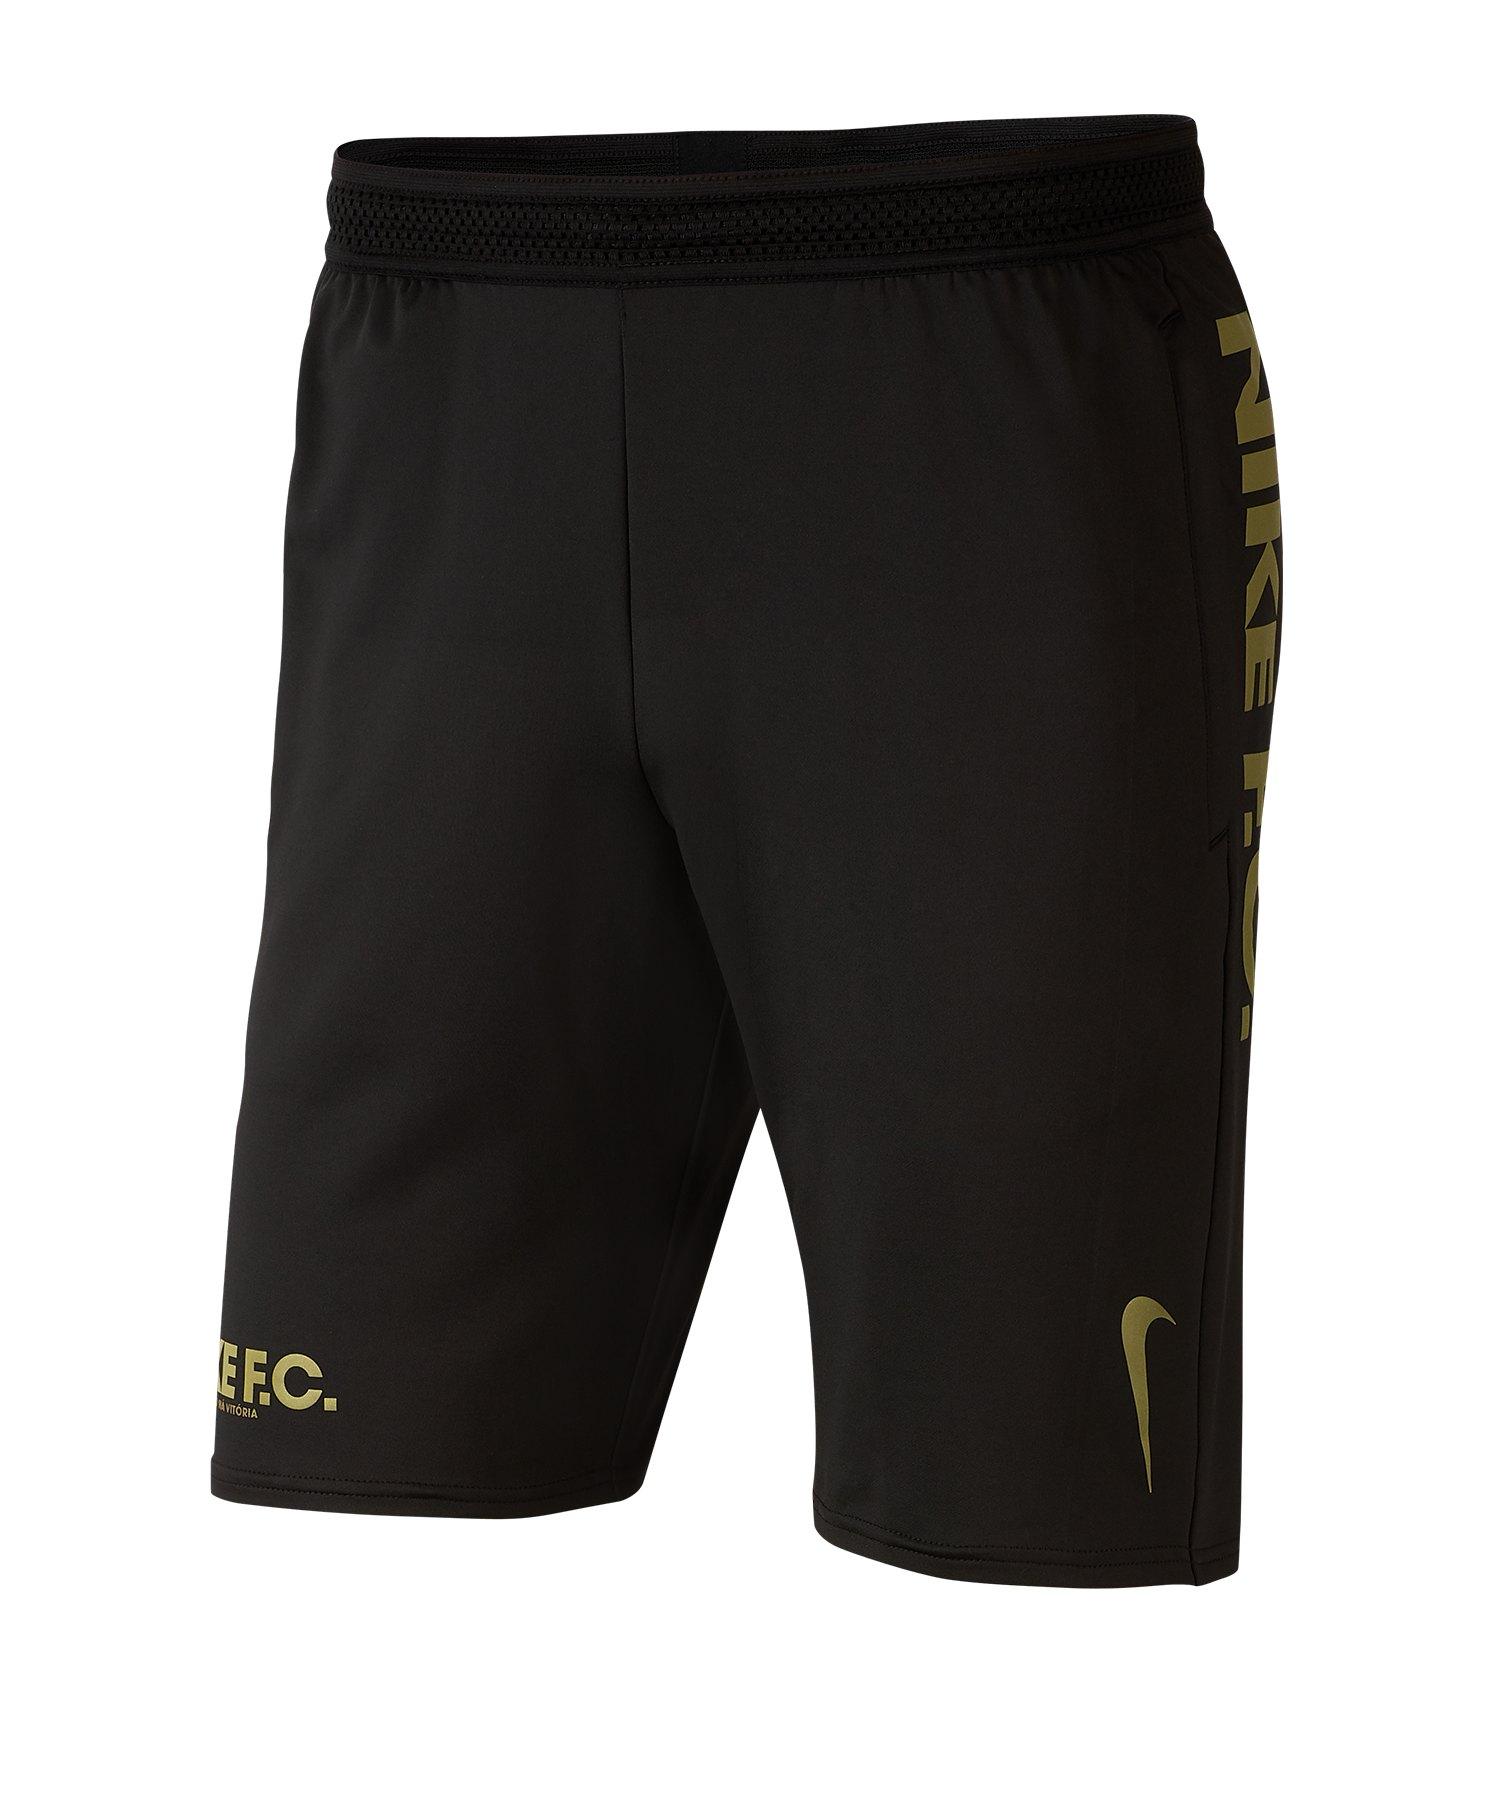 Nike F.C. Knit Short Schwarz F010 - schwarz